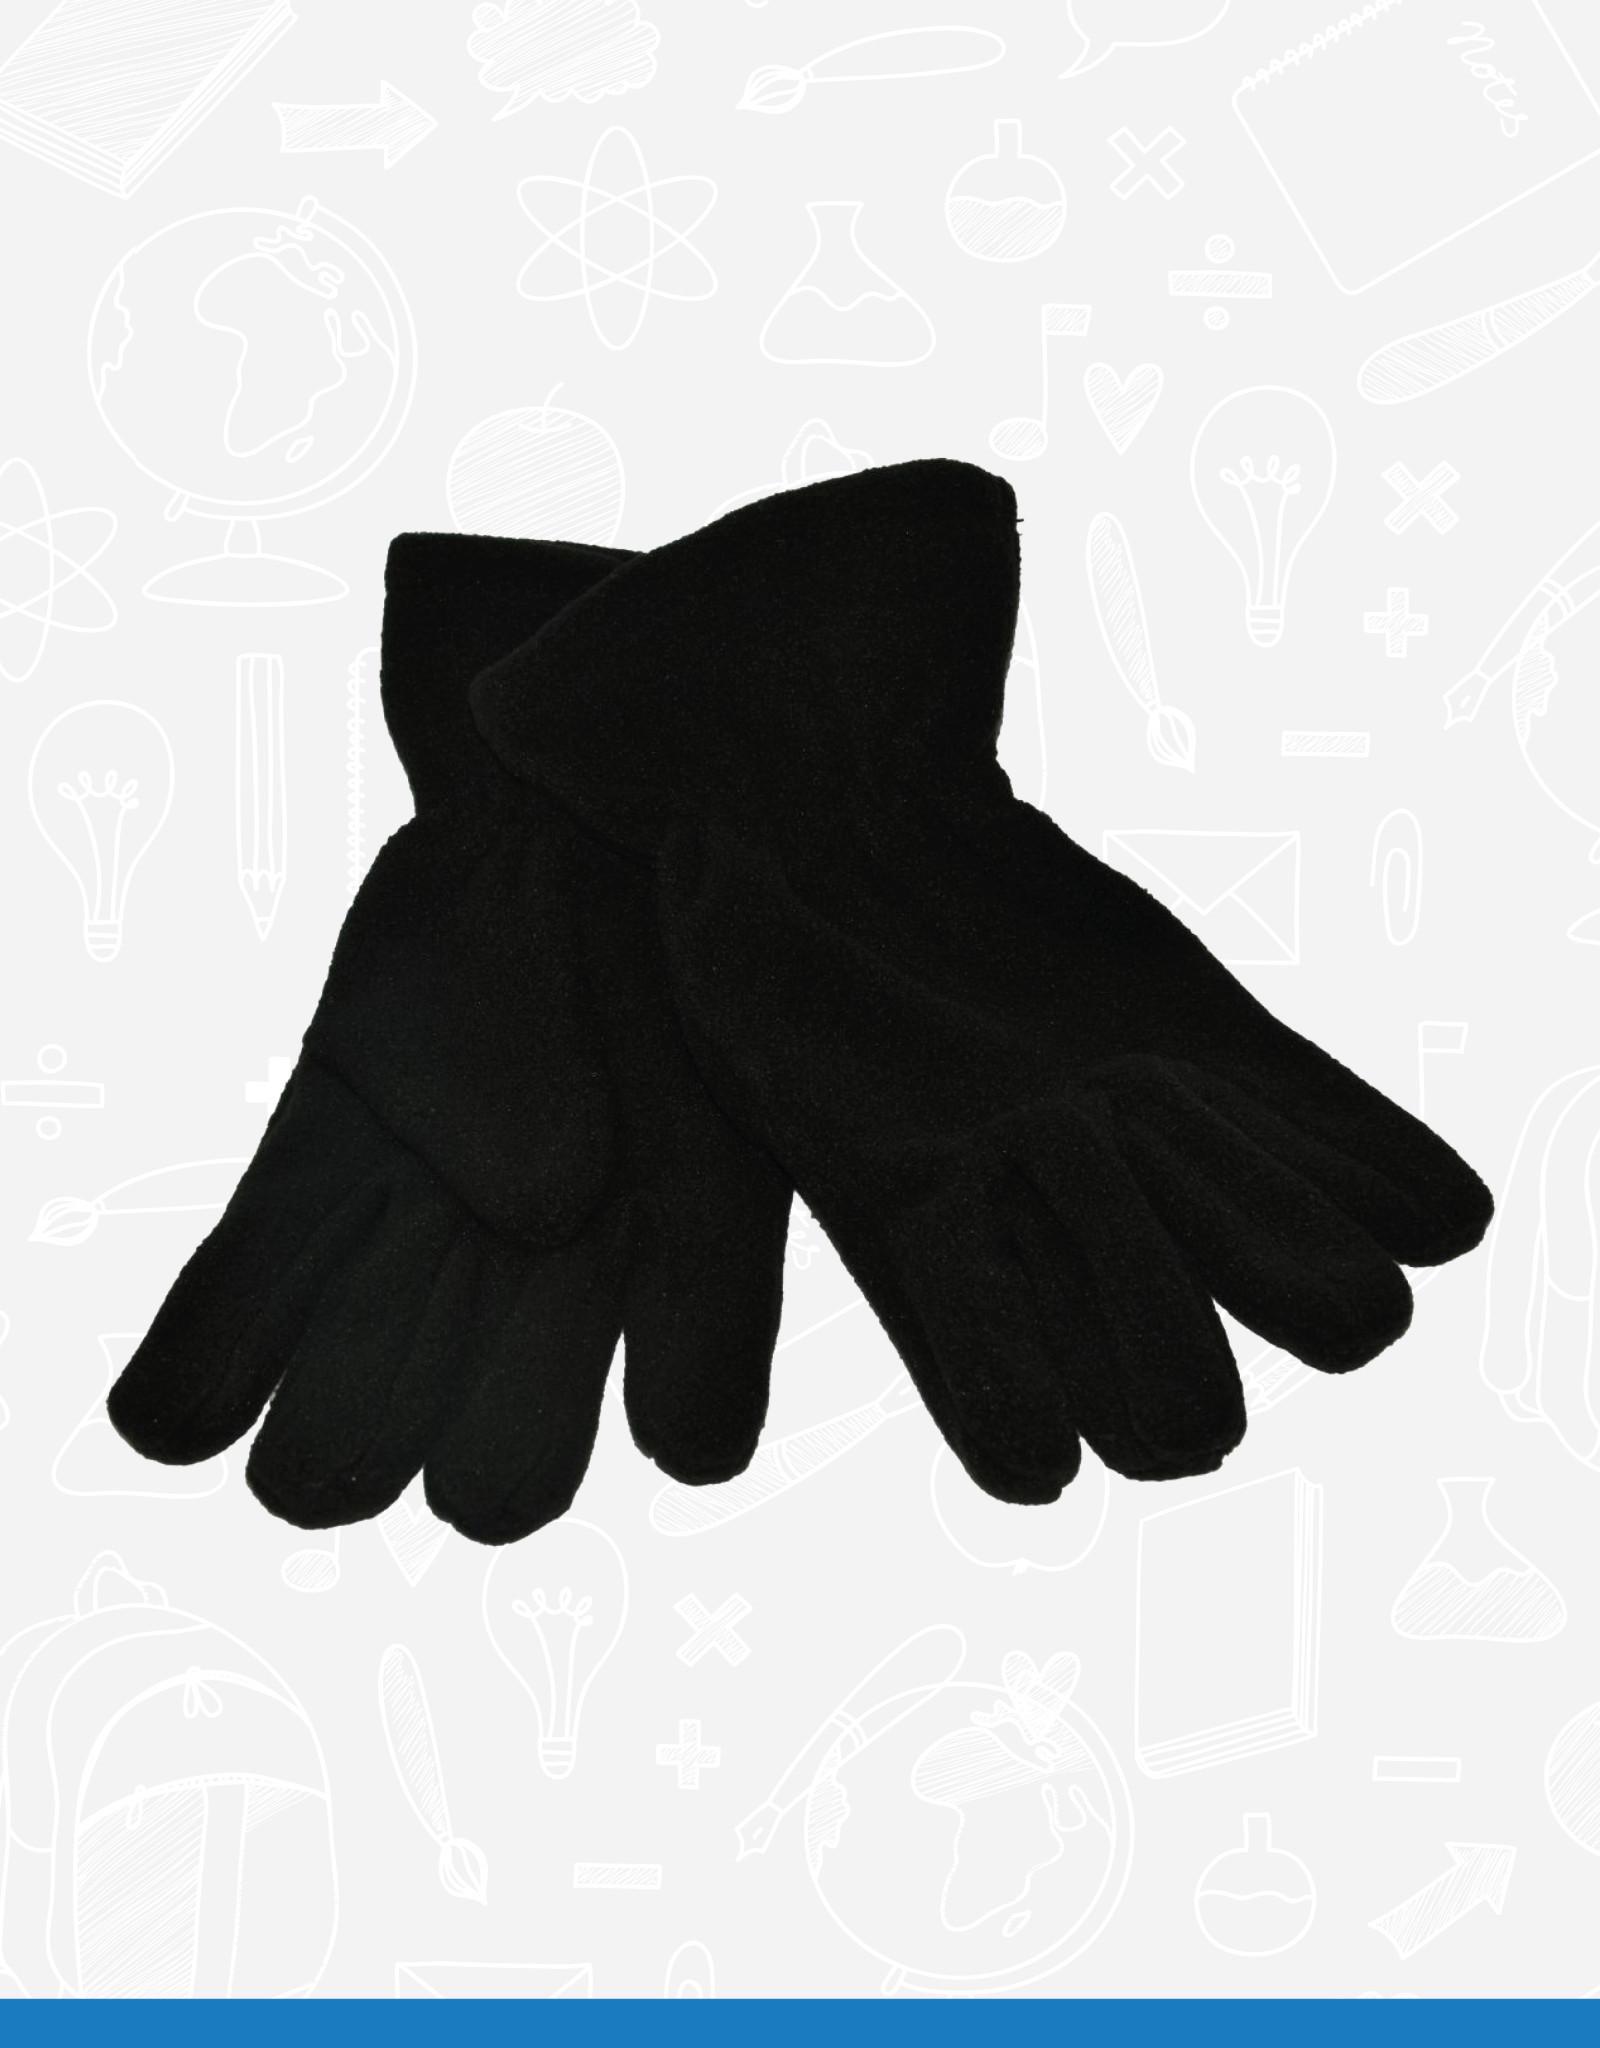 William Turner Fleece Gloves (FG99)